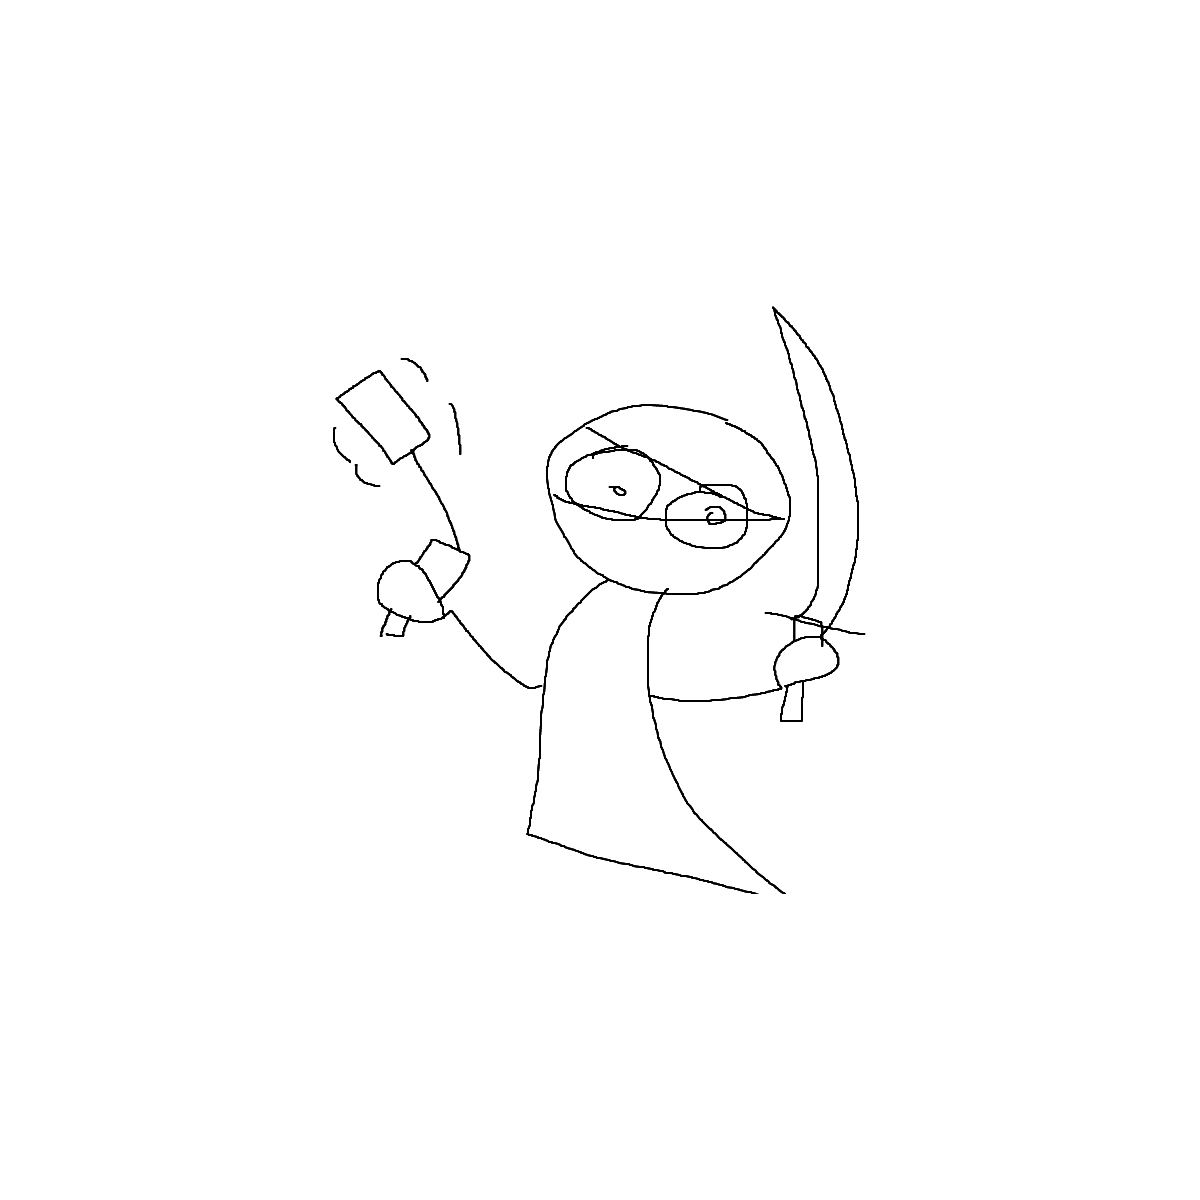 BAAAM drawing#1777 lat:47.5136604309082000lng: 3.5425729751586914